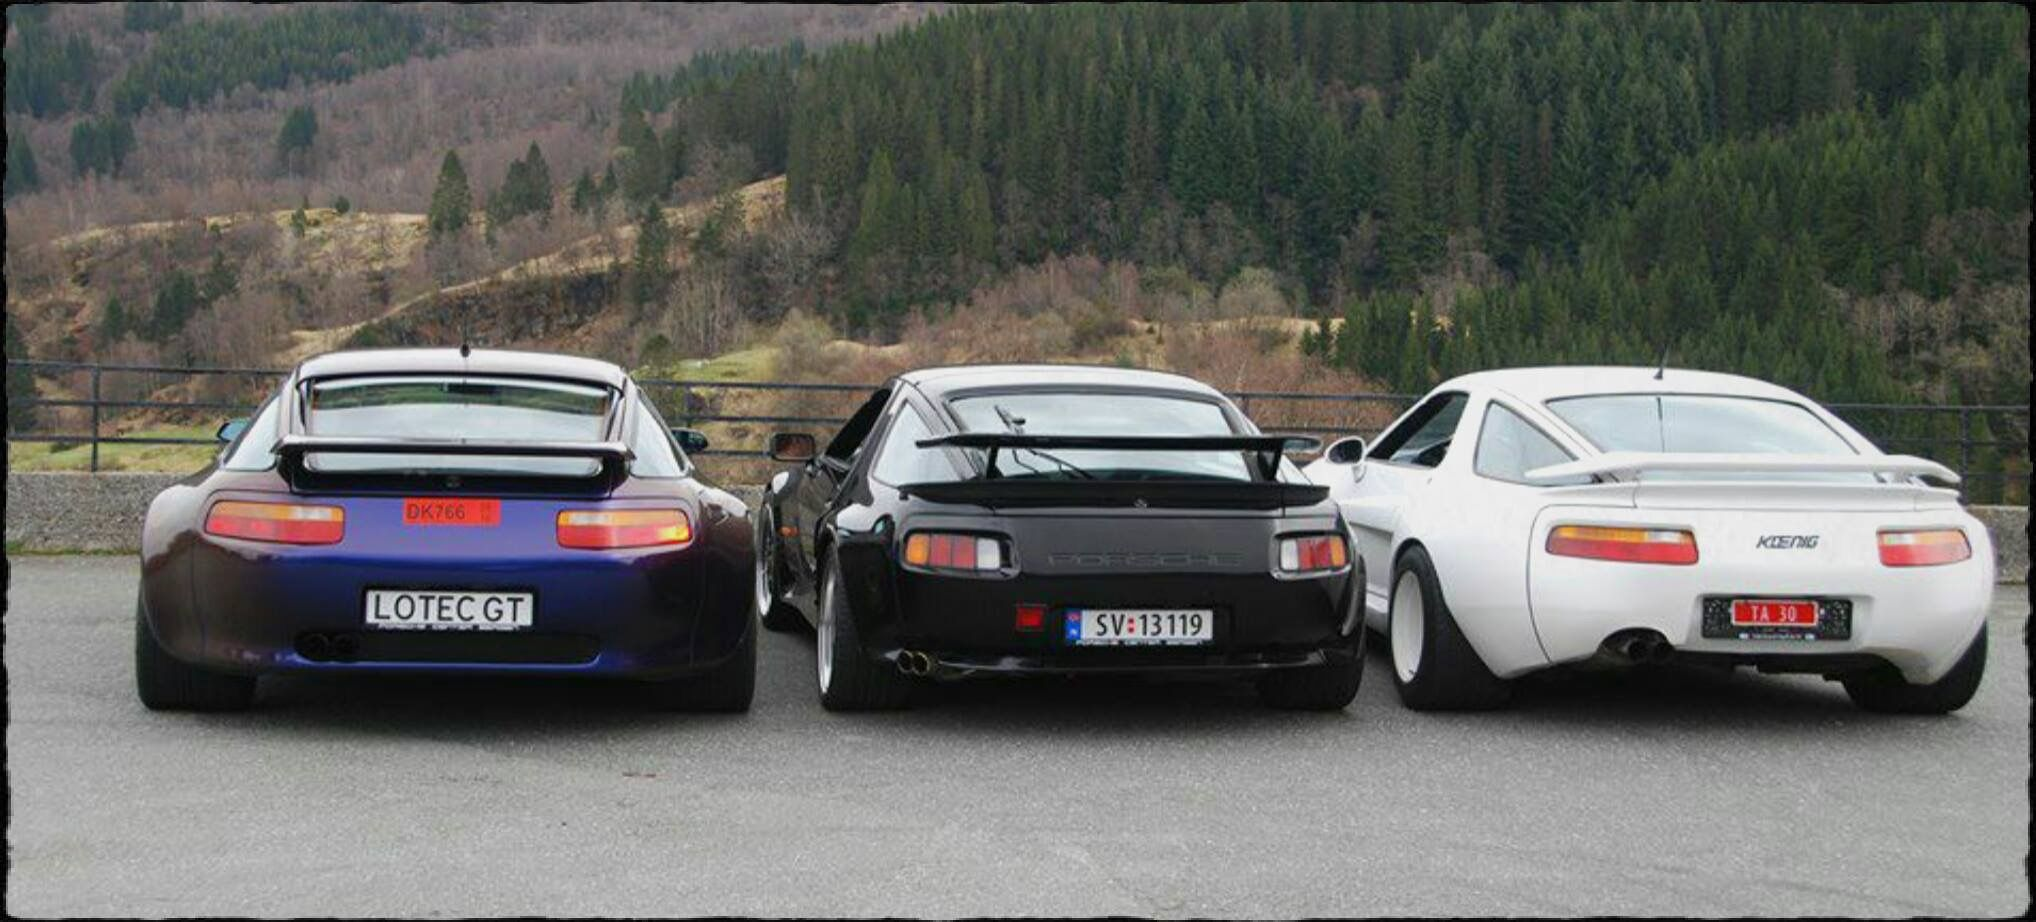 Porsche 928 Lotec Strosek Koenig Porsche 928 Porsche